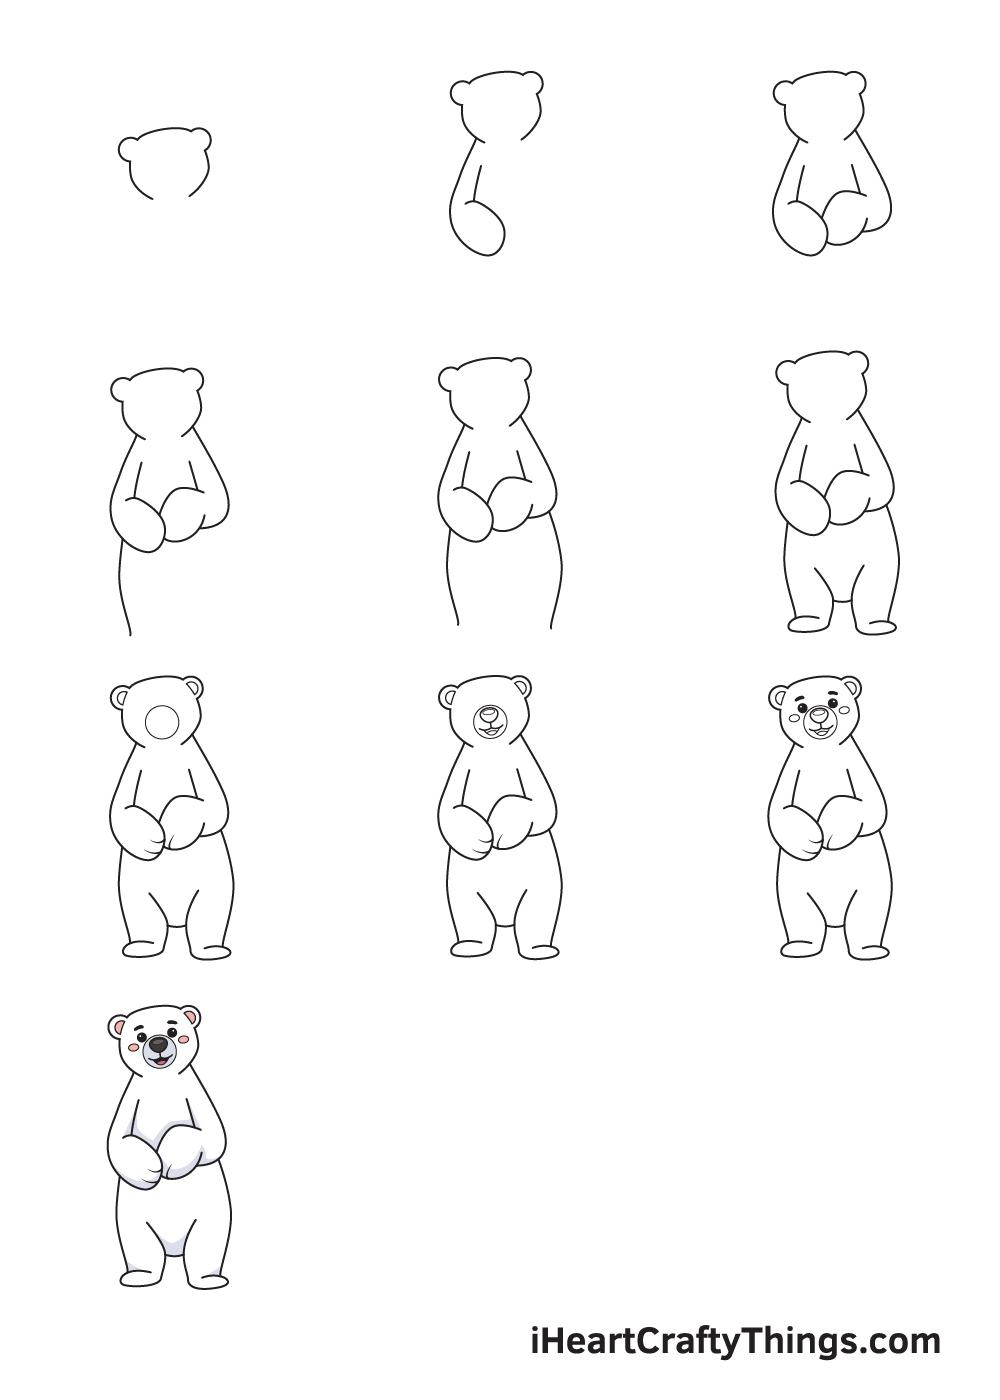 drawing polar bear in 9 easy steps